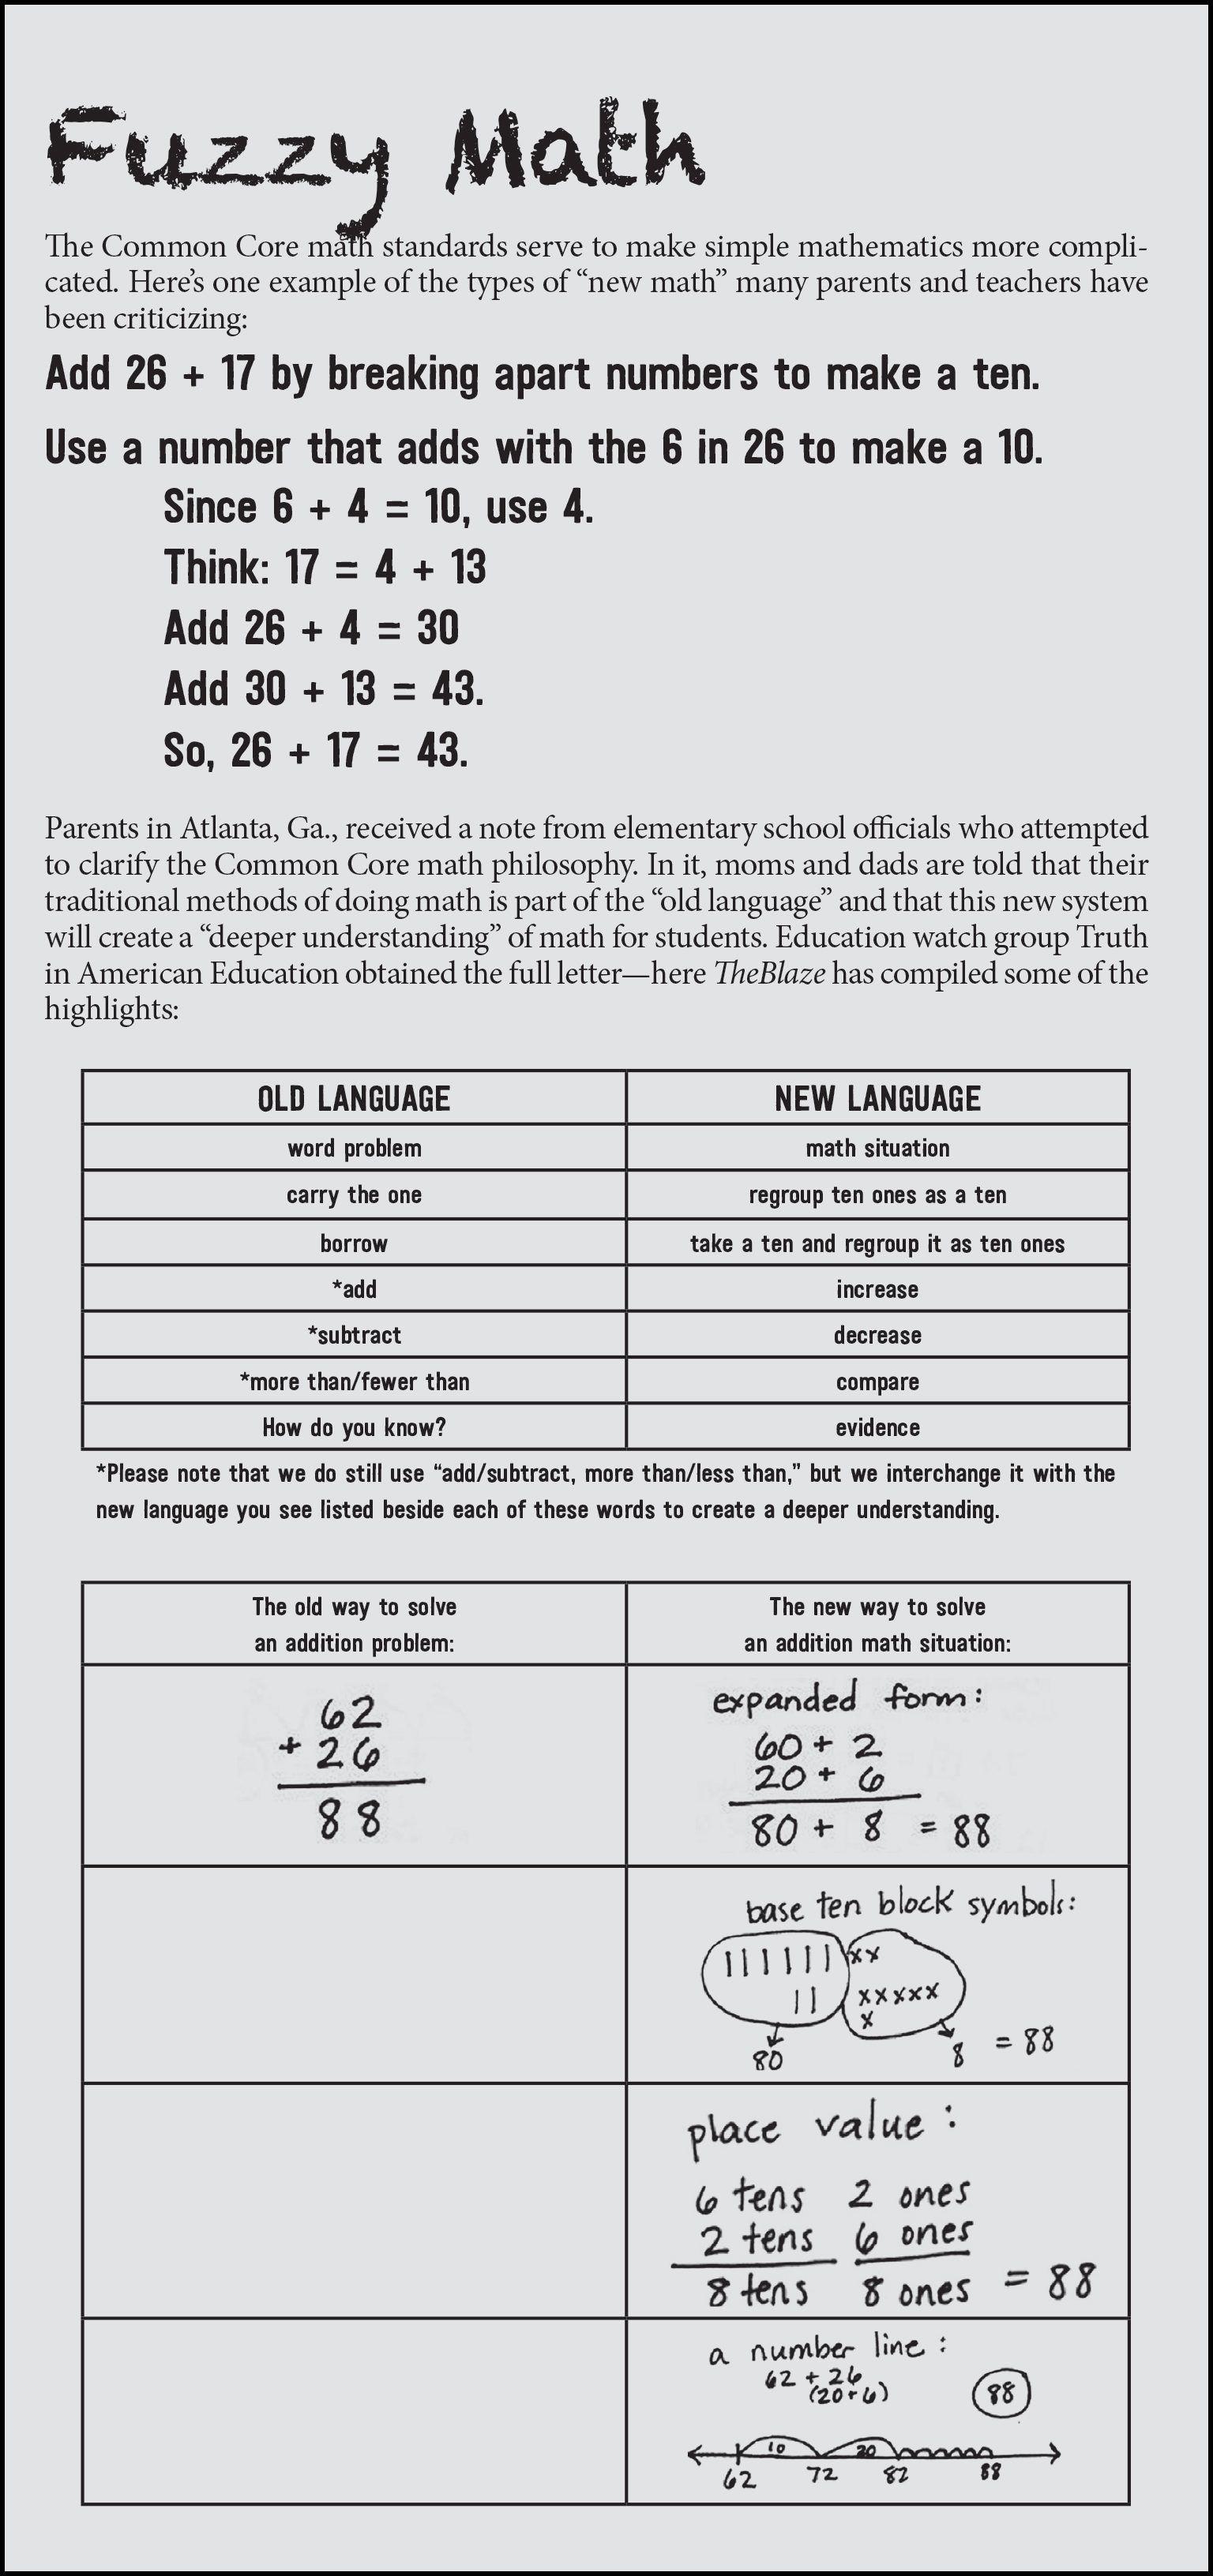 Final theblaze magazine may 2014 issue common core fuzzy final theblaze magazine may 2014 issue common core fuzzy math buycottarizona Images